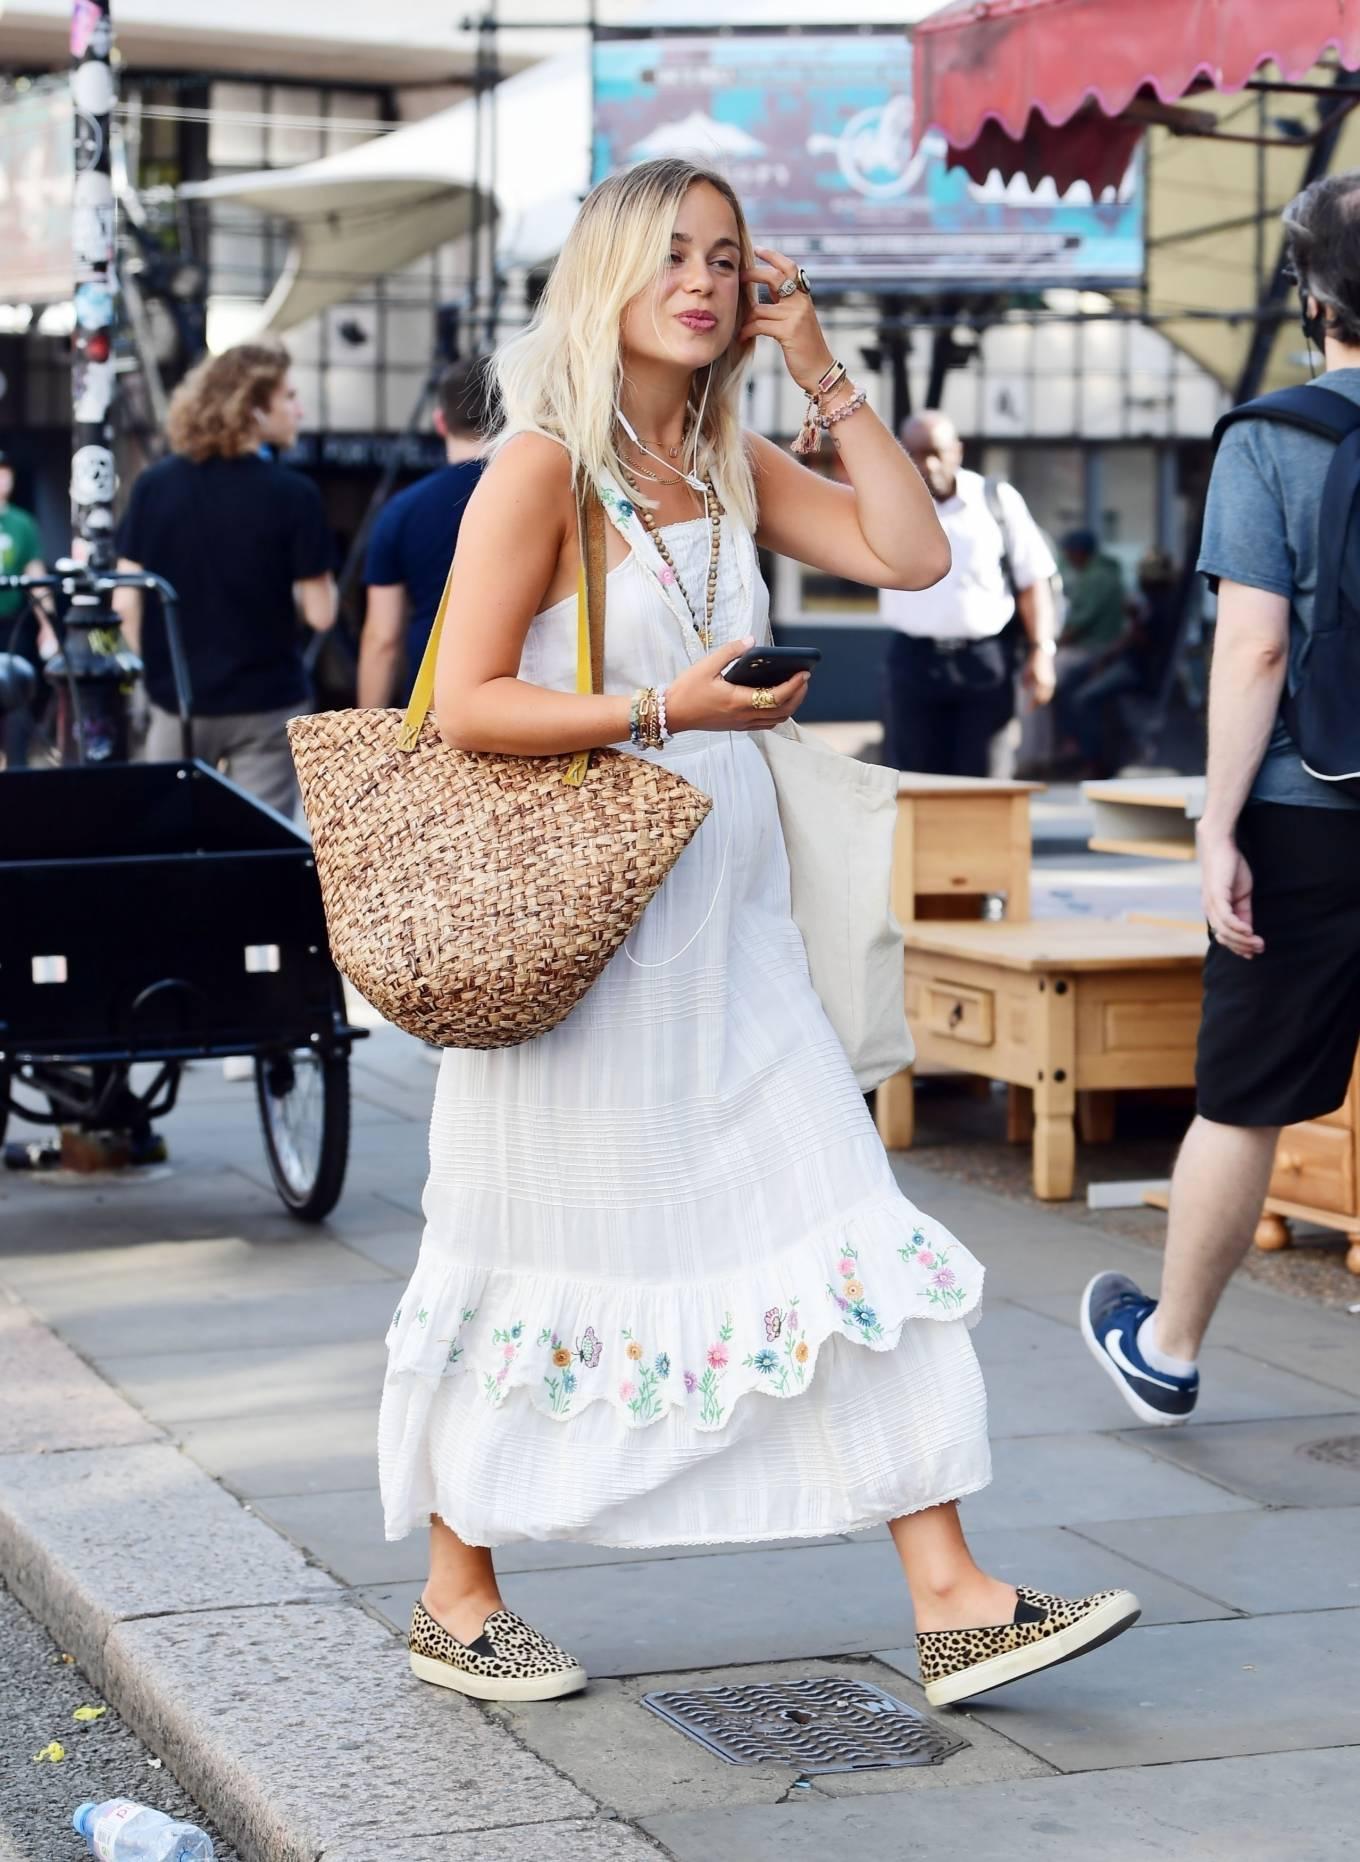 Amelia Windsor 2020 : Amelia Windsor – Looks stunning in a white summery dress in London-07